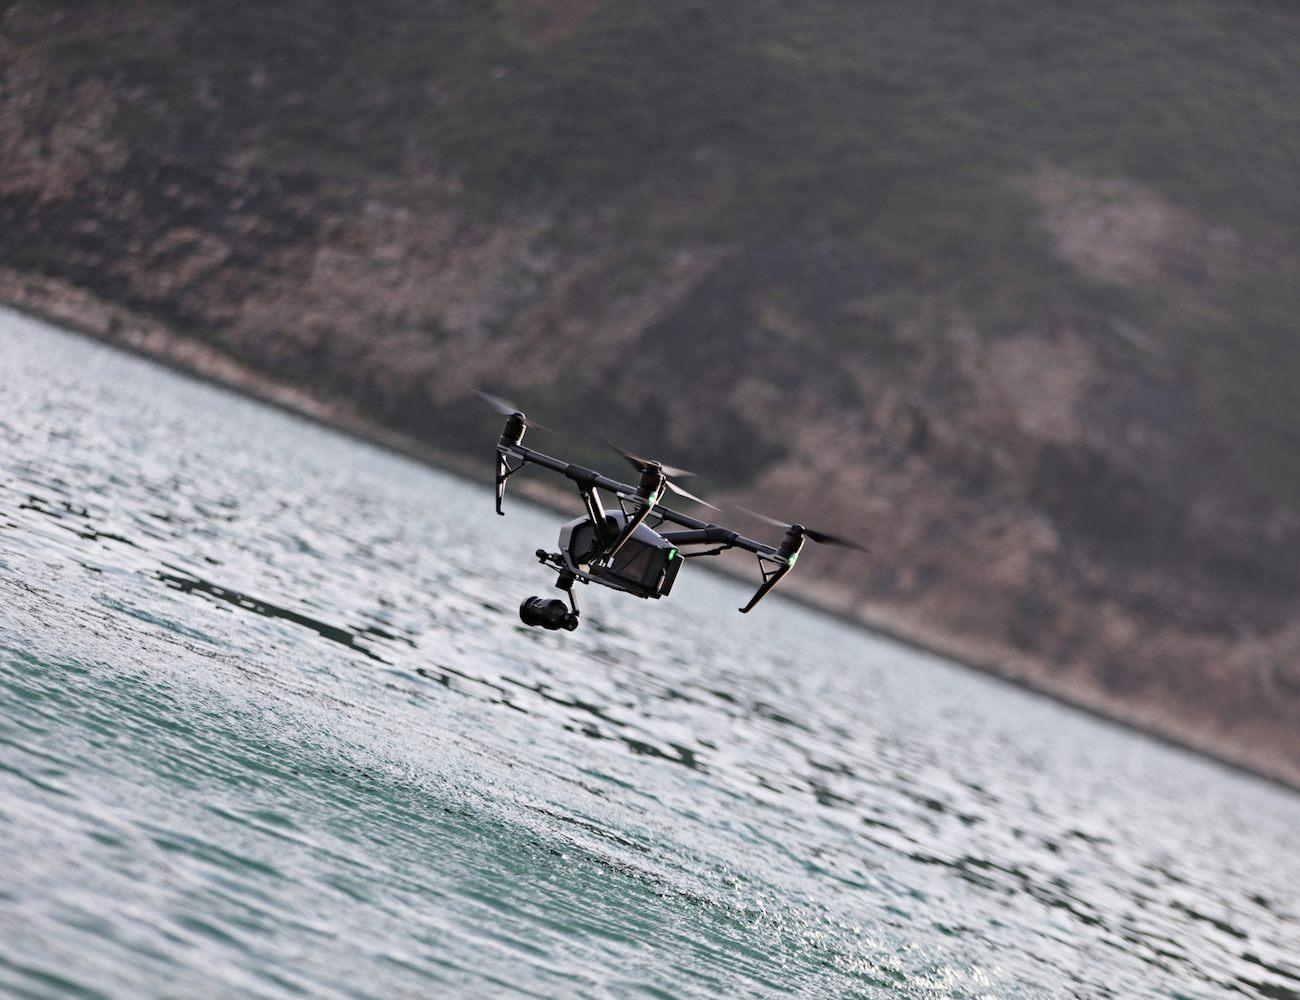 DJI Inspire 2 Drone